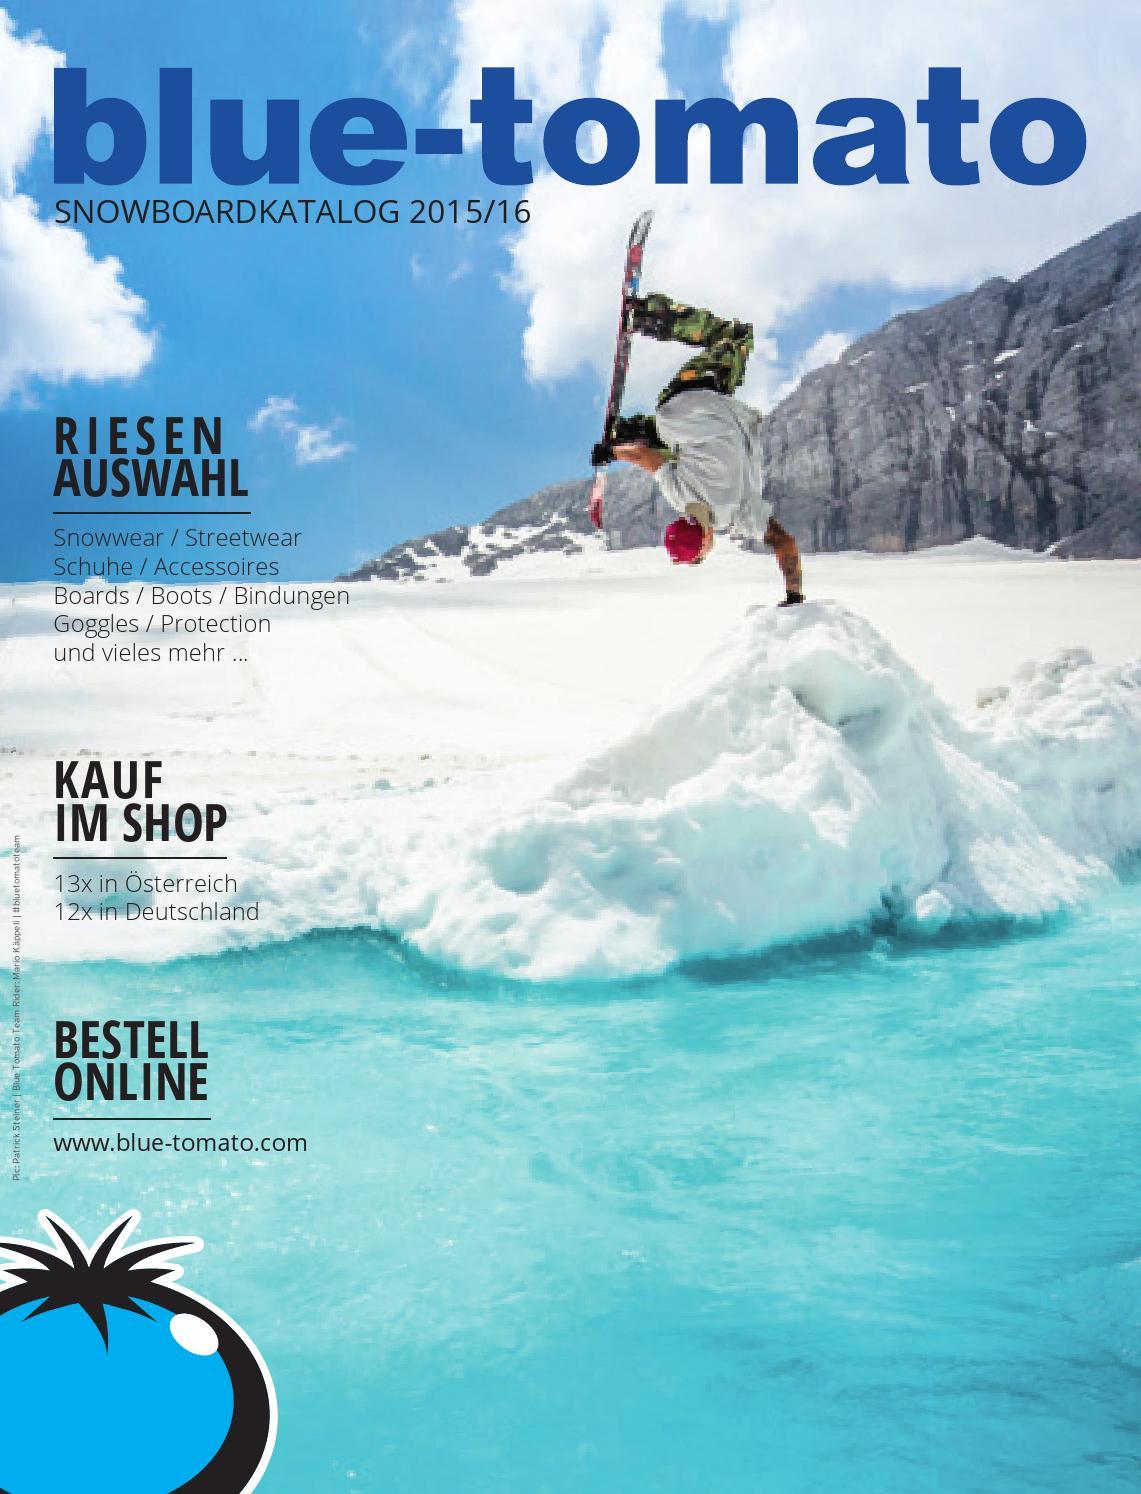 7670b790aa78a Blue Tomato Snowboard Katalog 2015 16 by Blue Tomato - issuu